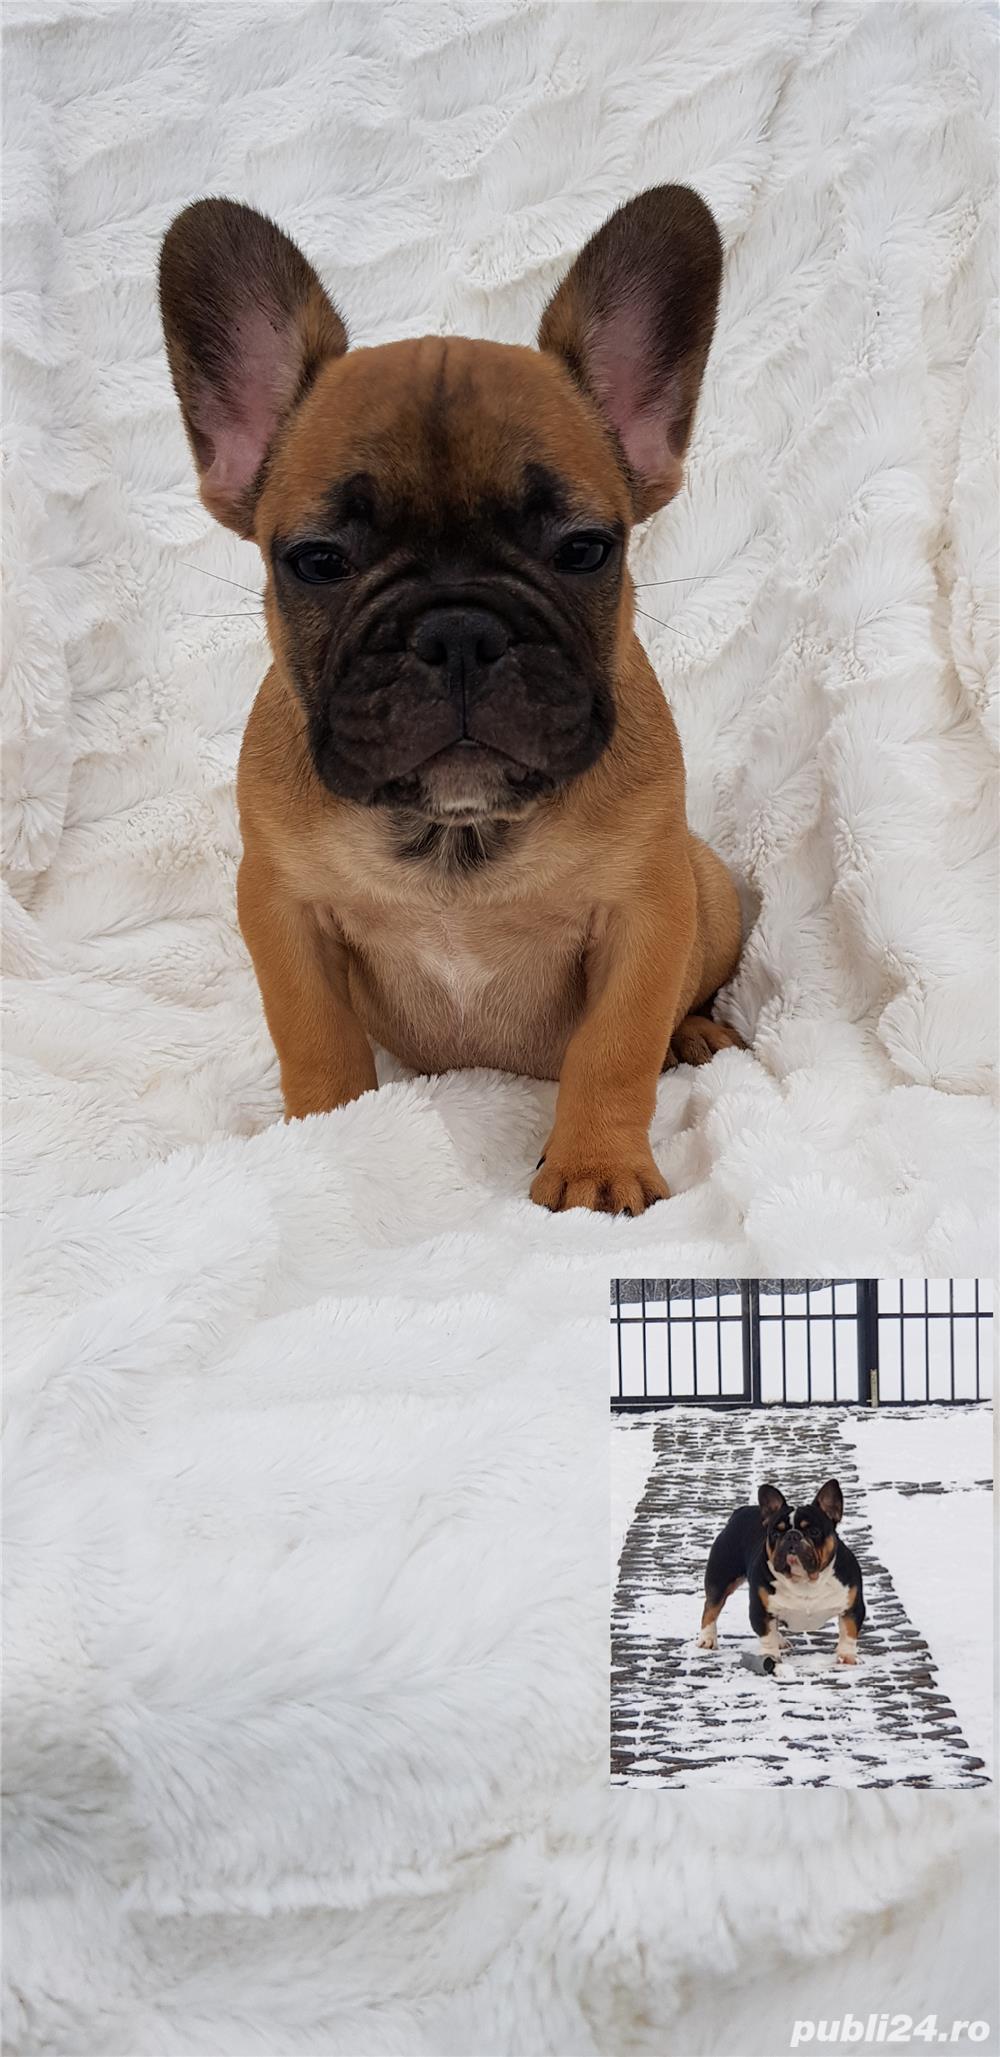 Femela bulldog francez!